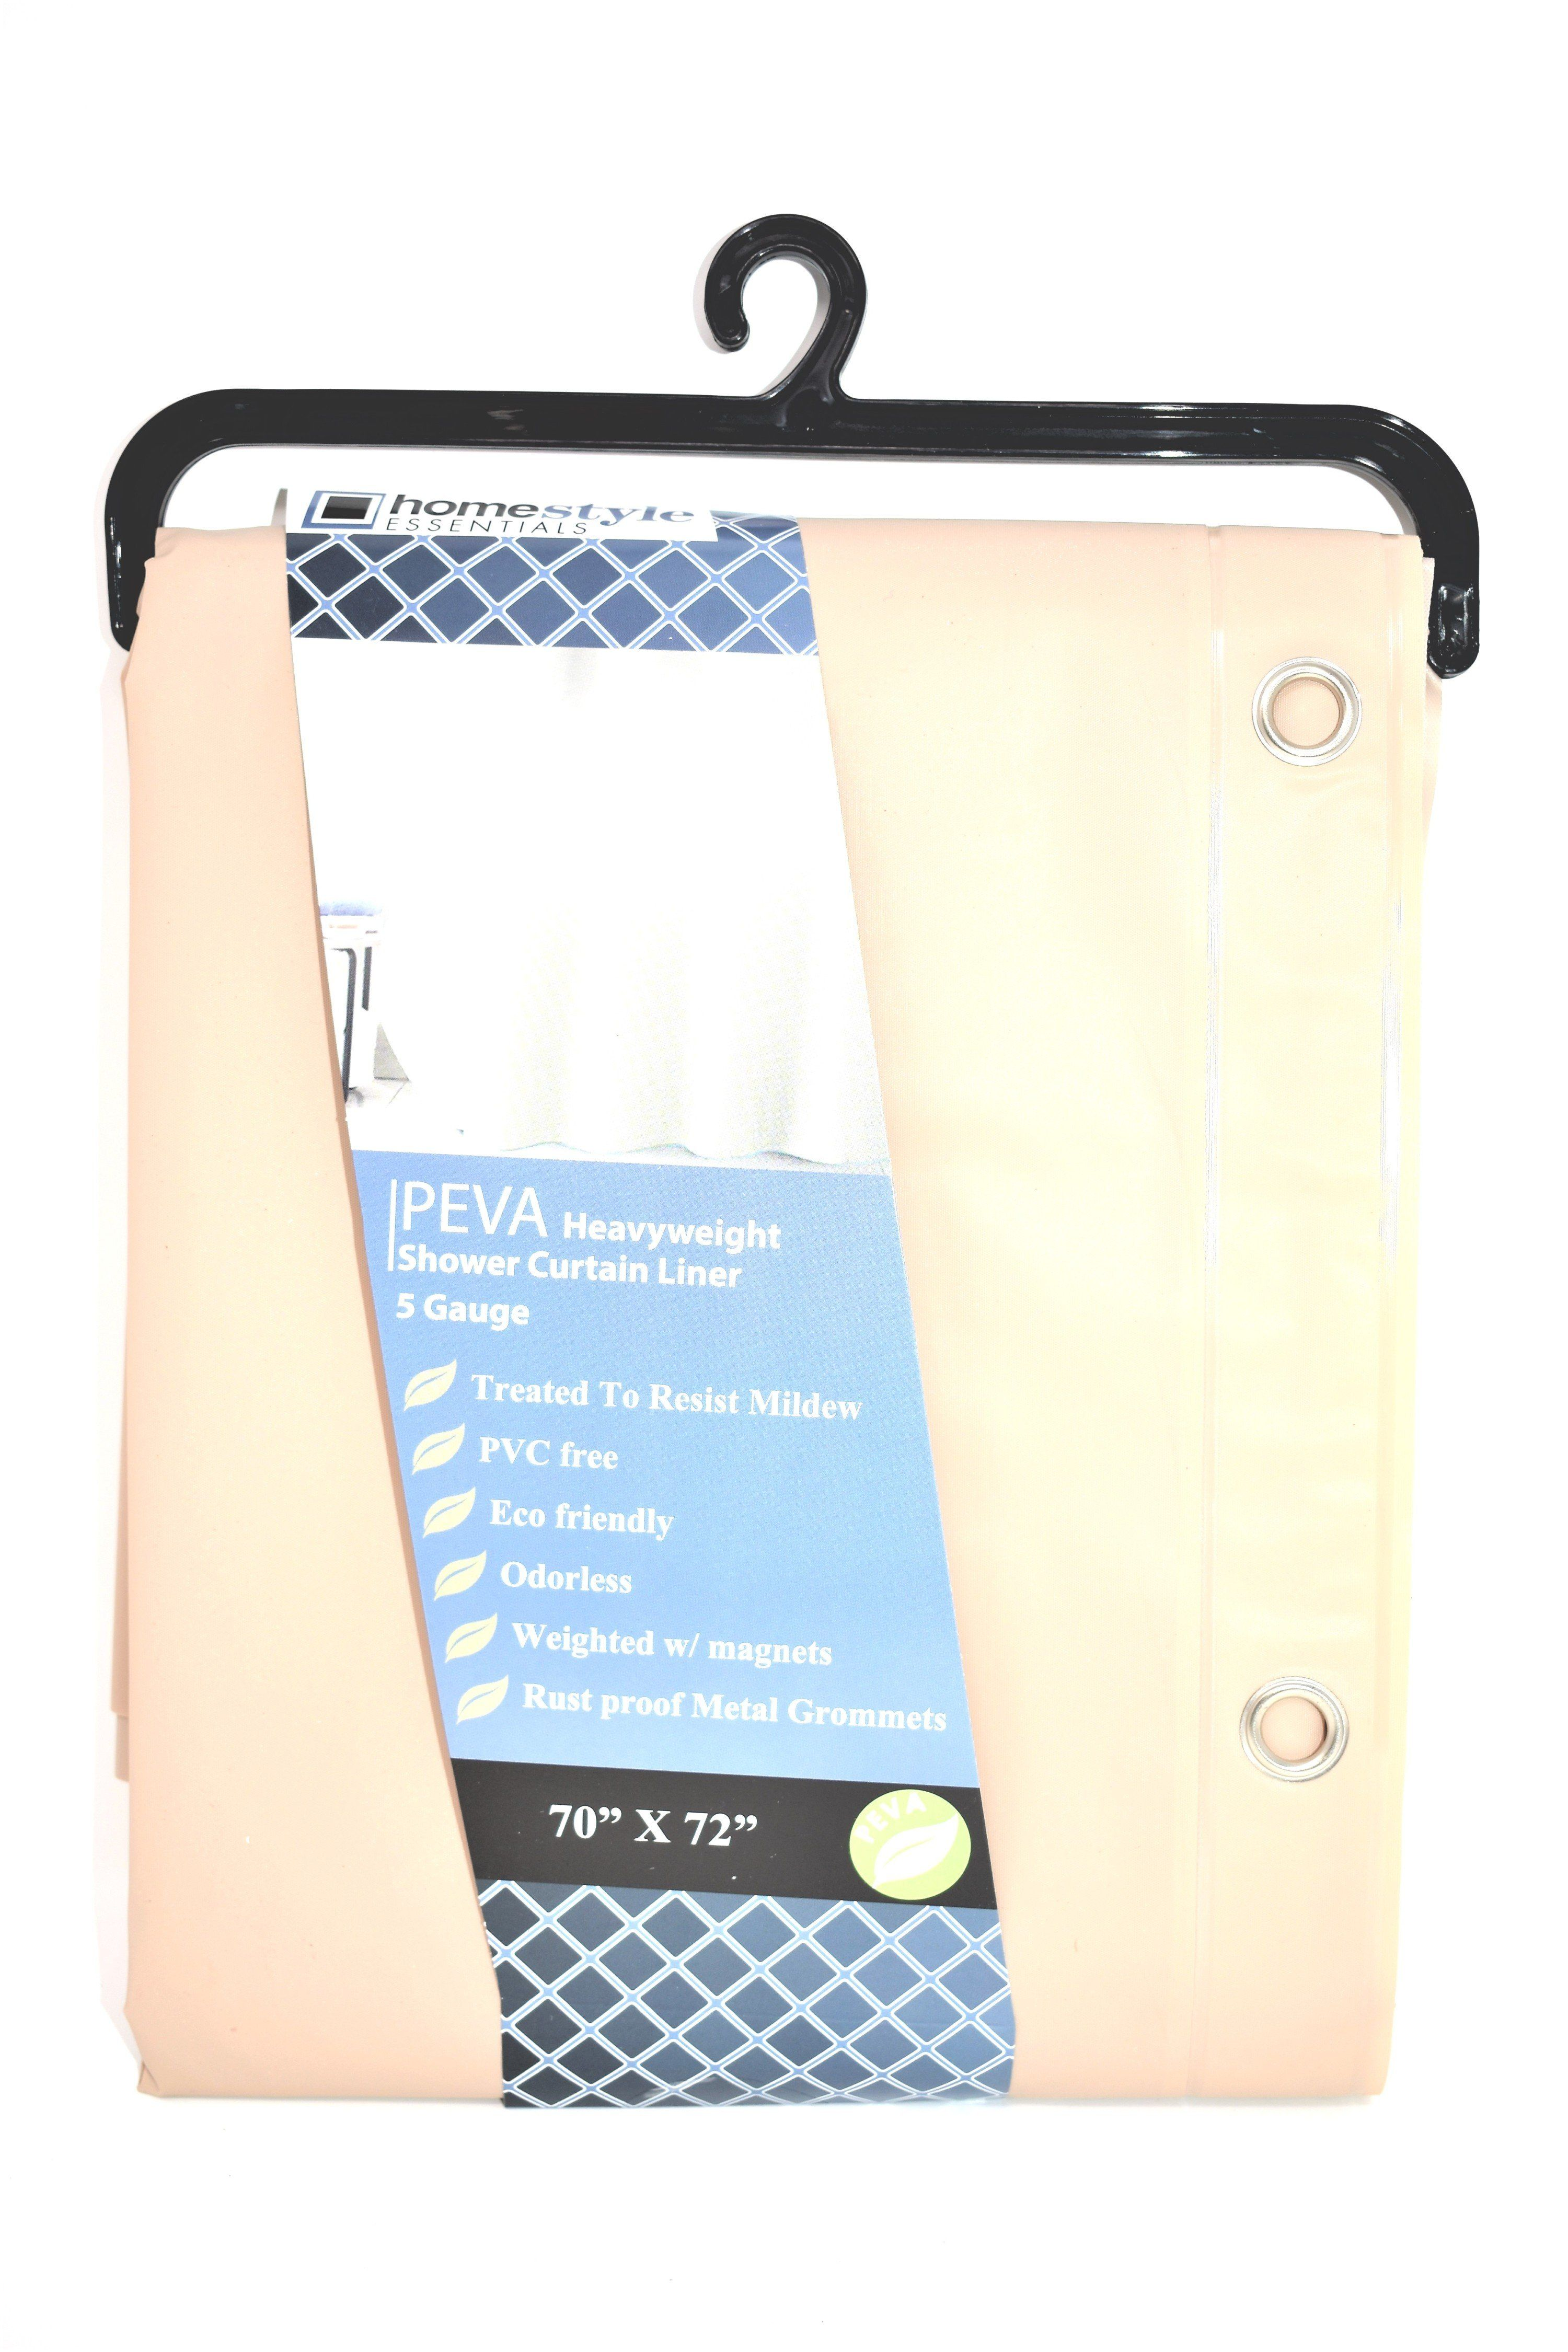 Peva Heavyweight Shower Curtain Liner Tan 5 Gauge 70 X 72